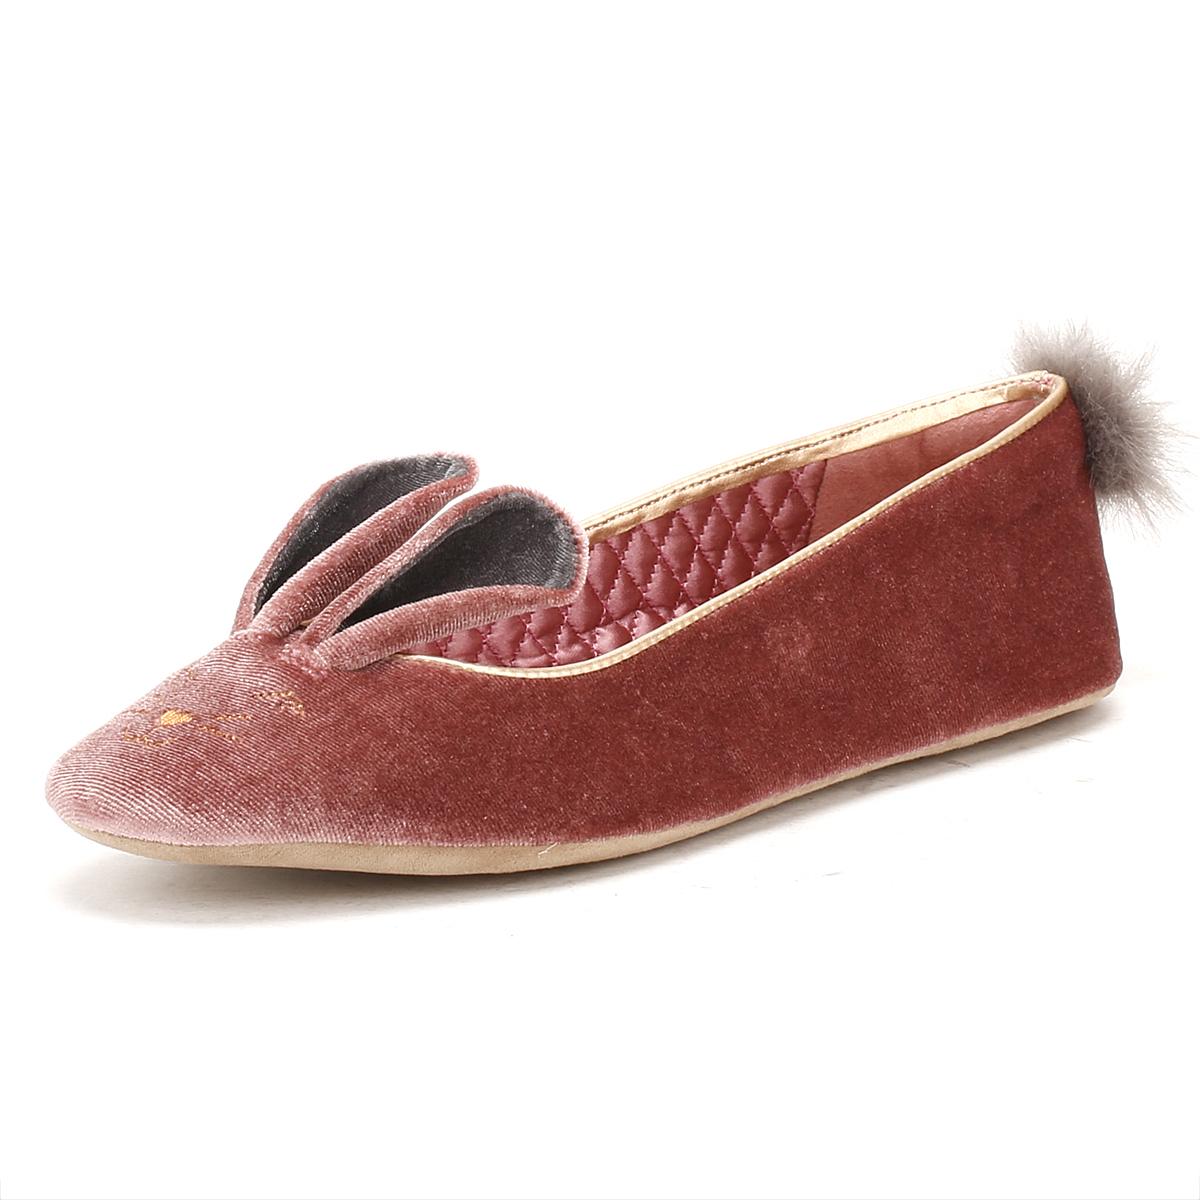 61025357b4031a Details about Ted Baker Womens Pink Bellamo Ballerina Slippers Rabbit Animal  Velvet Shoes